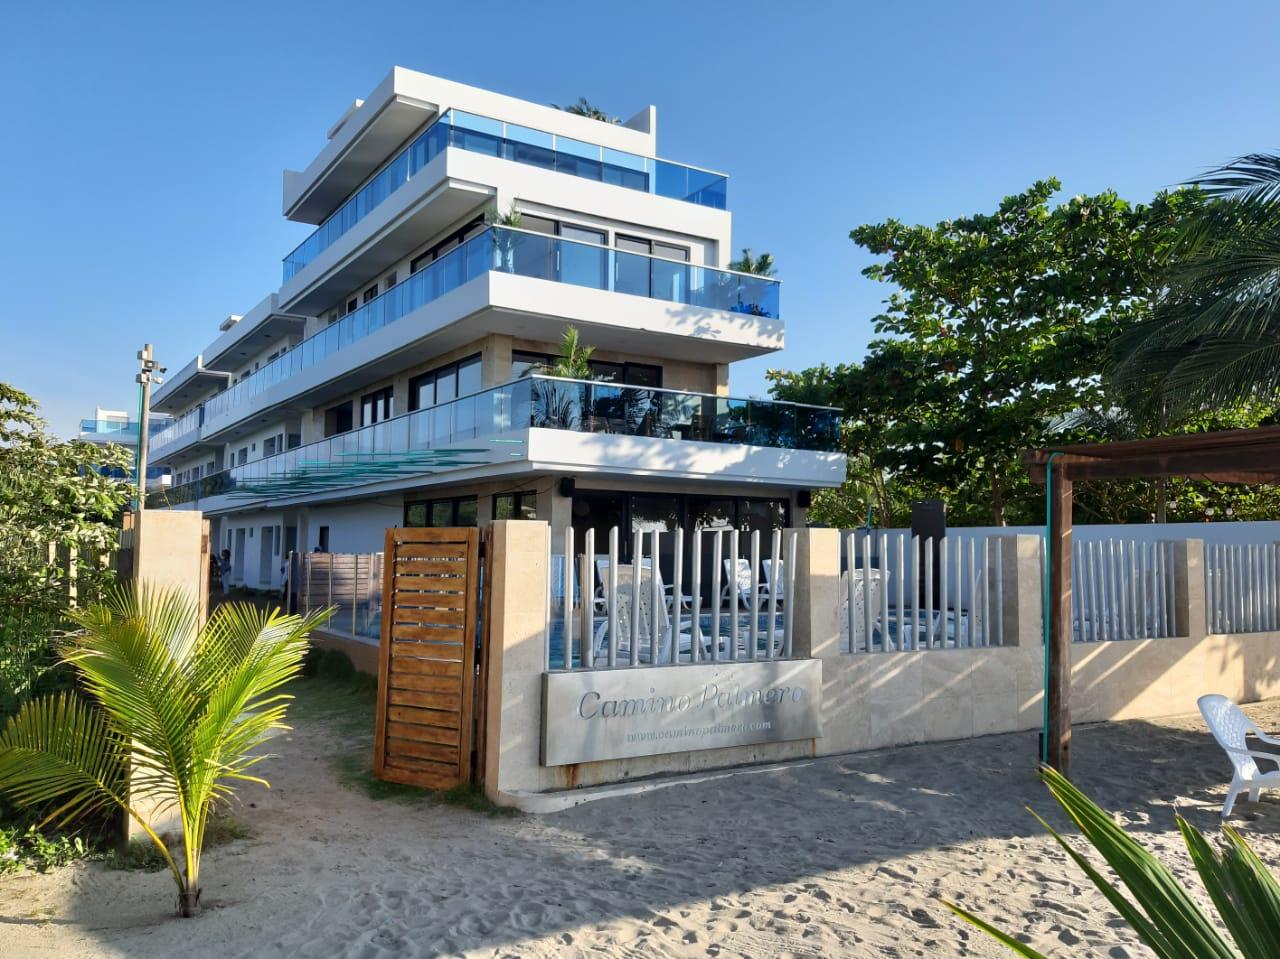 Fachada playa Hotel Camino Palmero Coveñ